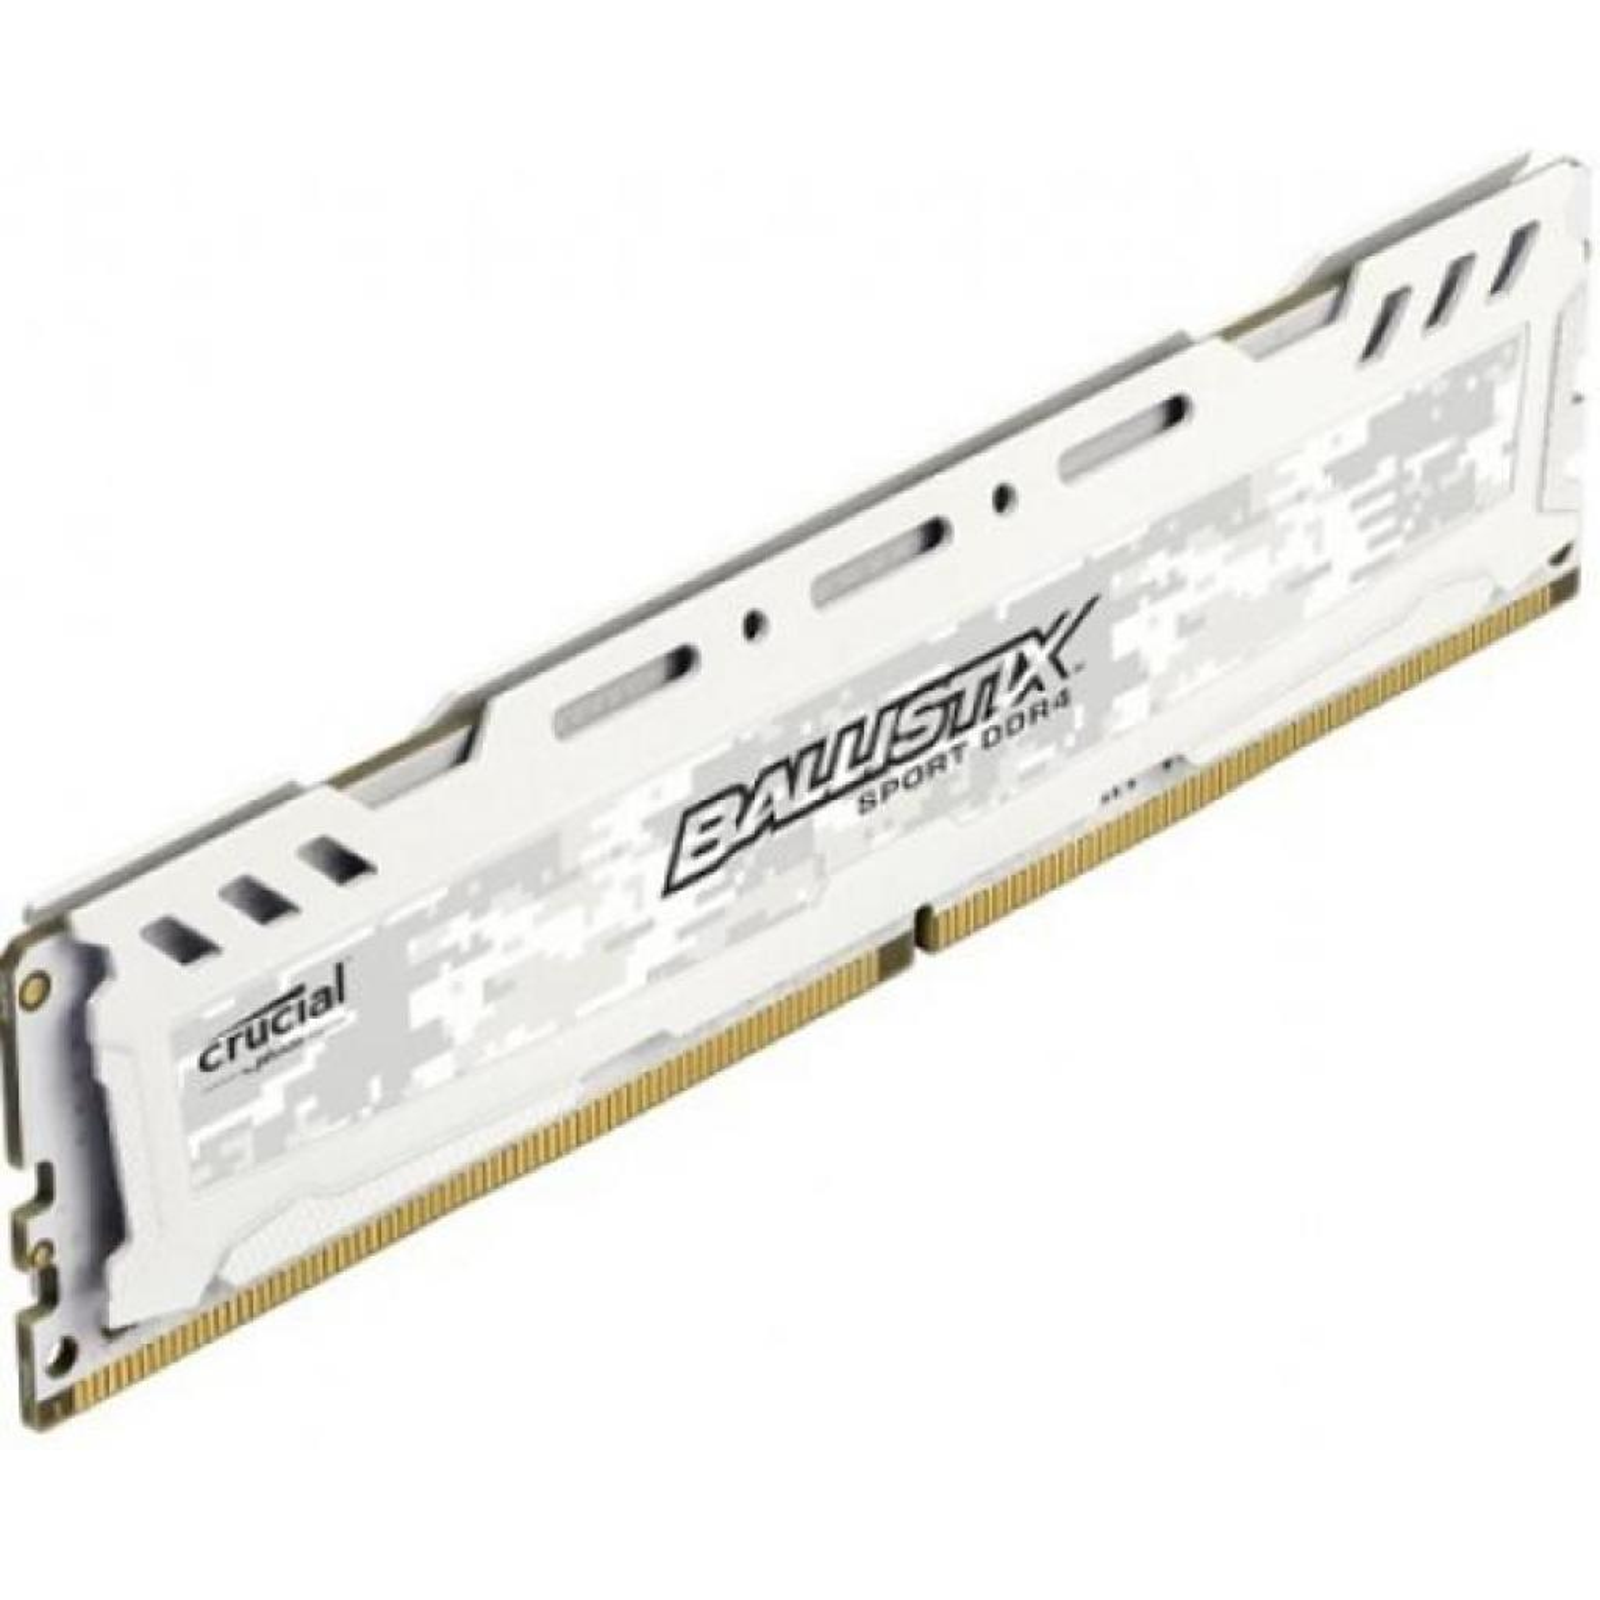 Модуль памяти для компьютера DDR4 8GB 2666 MHz Ballistix Sport LT White MICRON (BLS8G4D26BFSCK) изображение 2